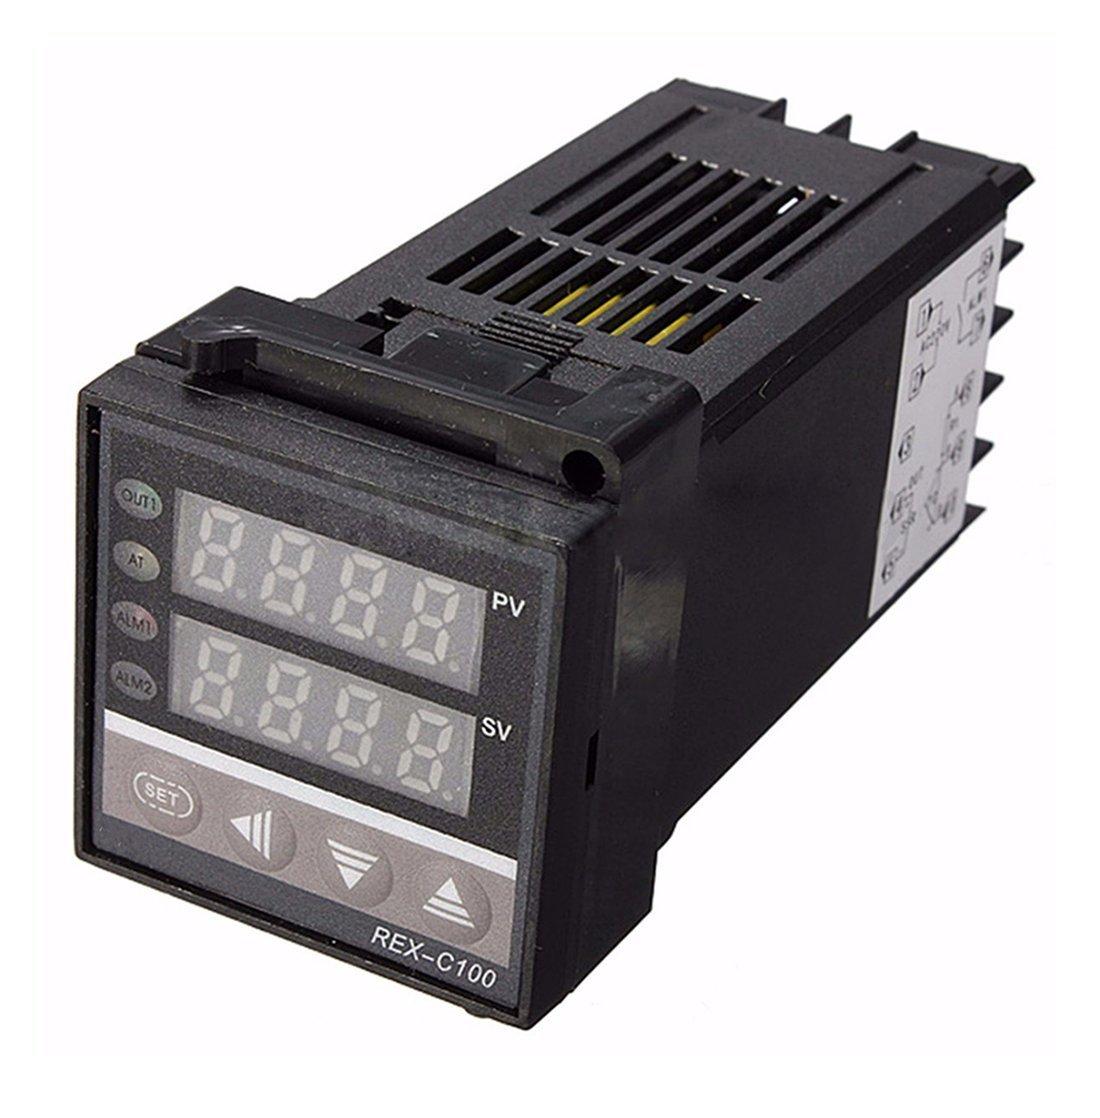 Temperature Controller PID REX-C100 digital 220 V K Thermocouple Heatsinks PID Controller Kit max.40A SSR